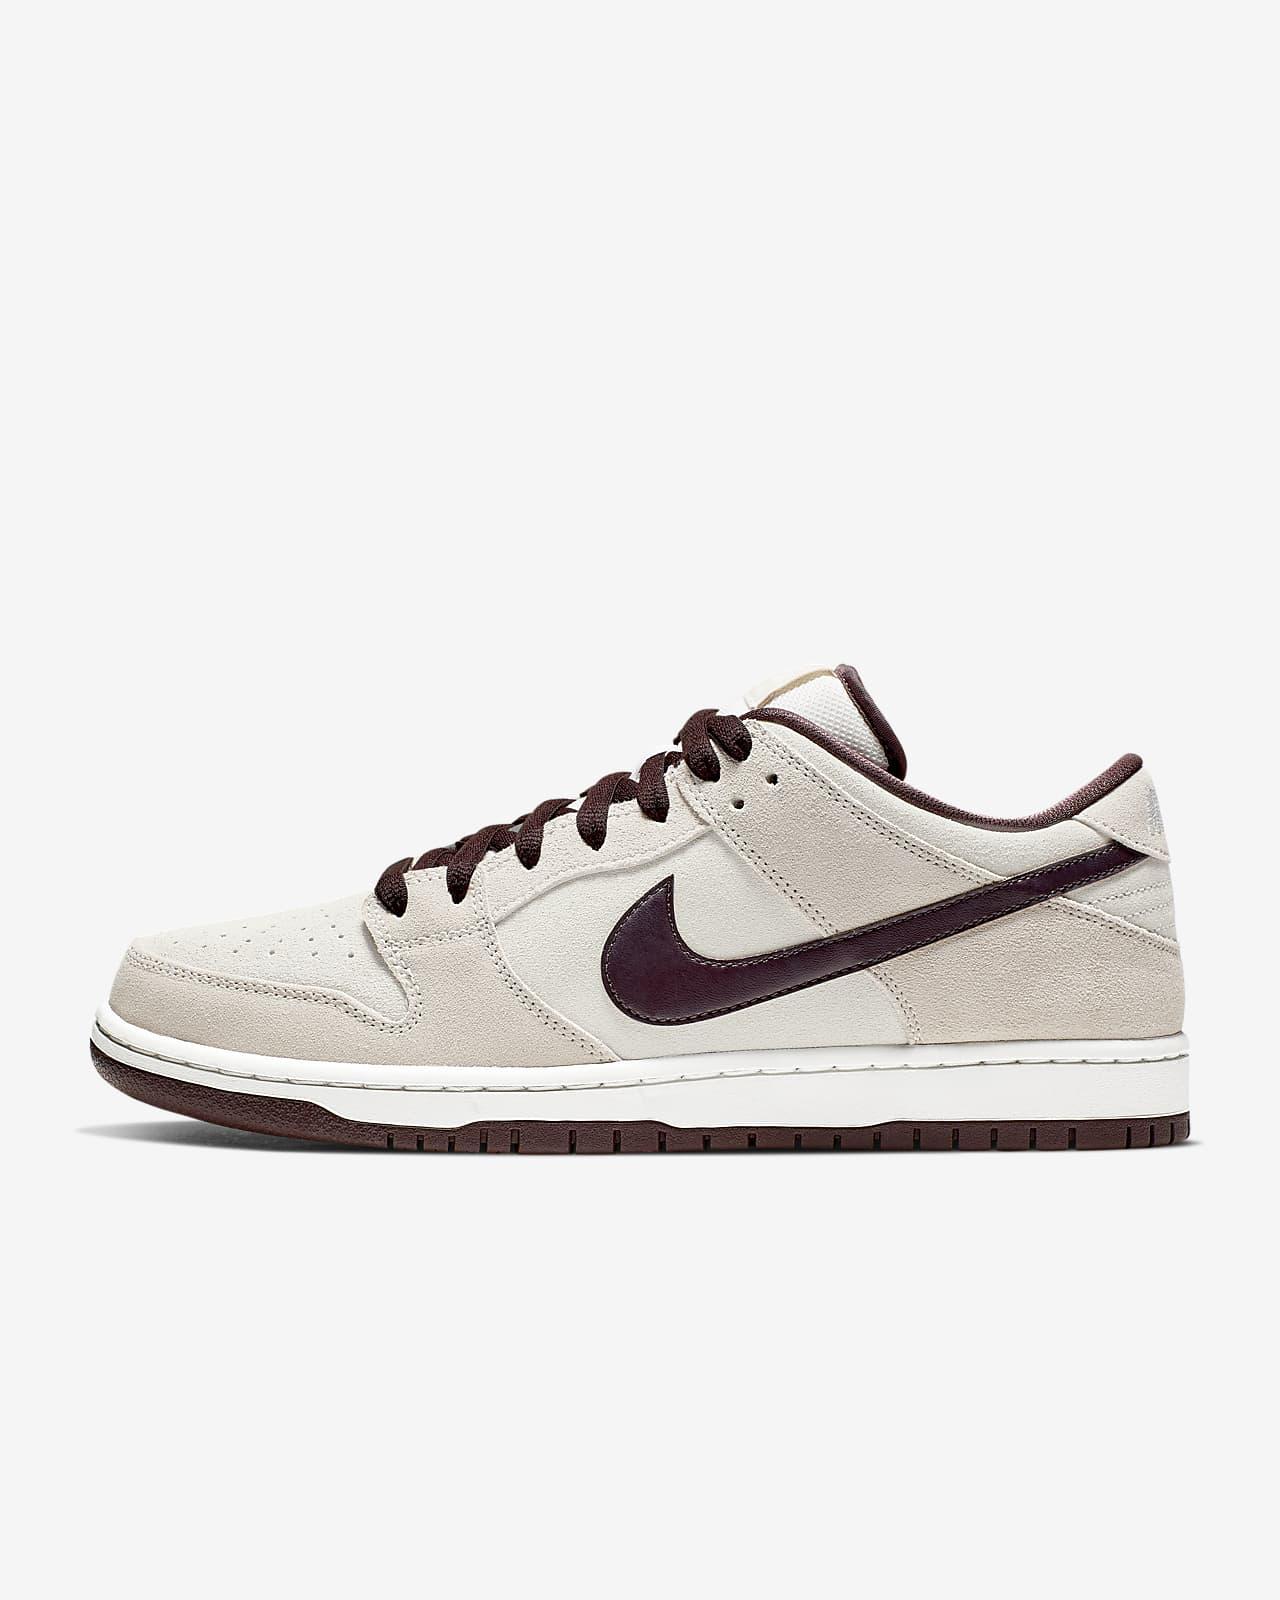 Nike SB Dunk Low Pro 男/女滑板鞋